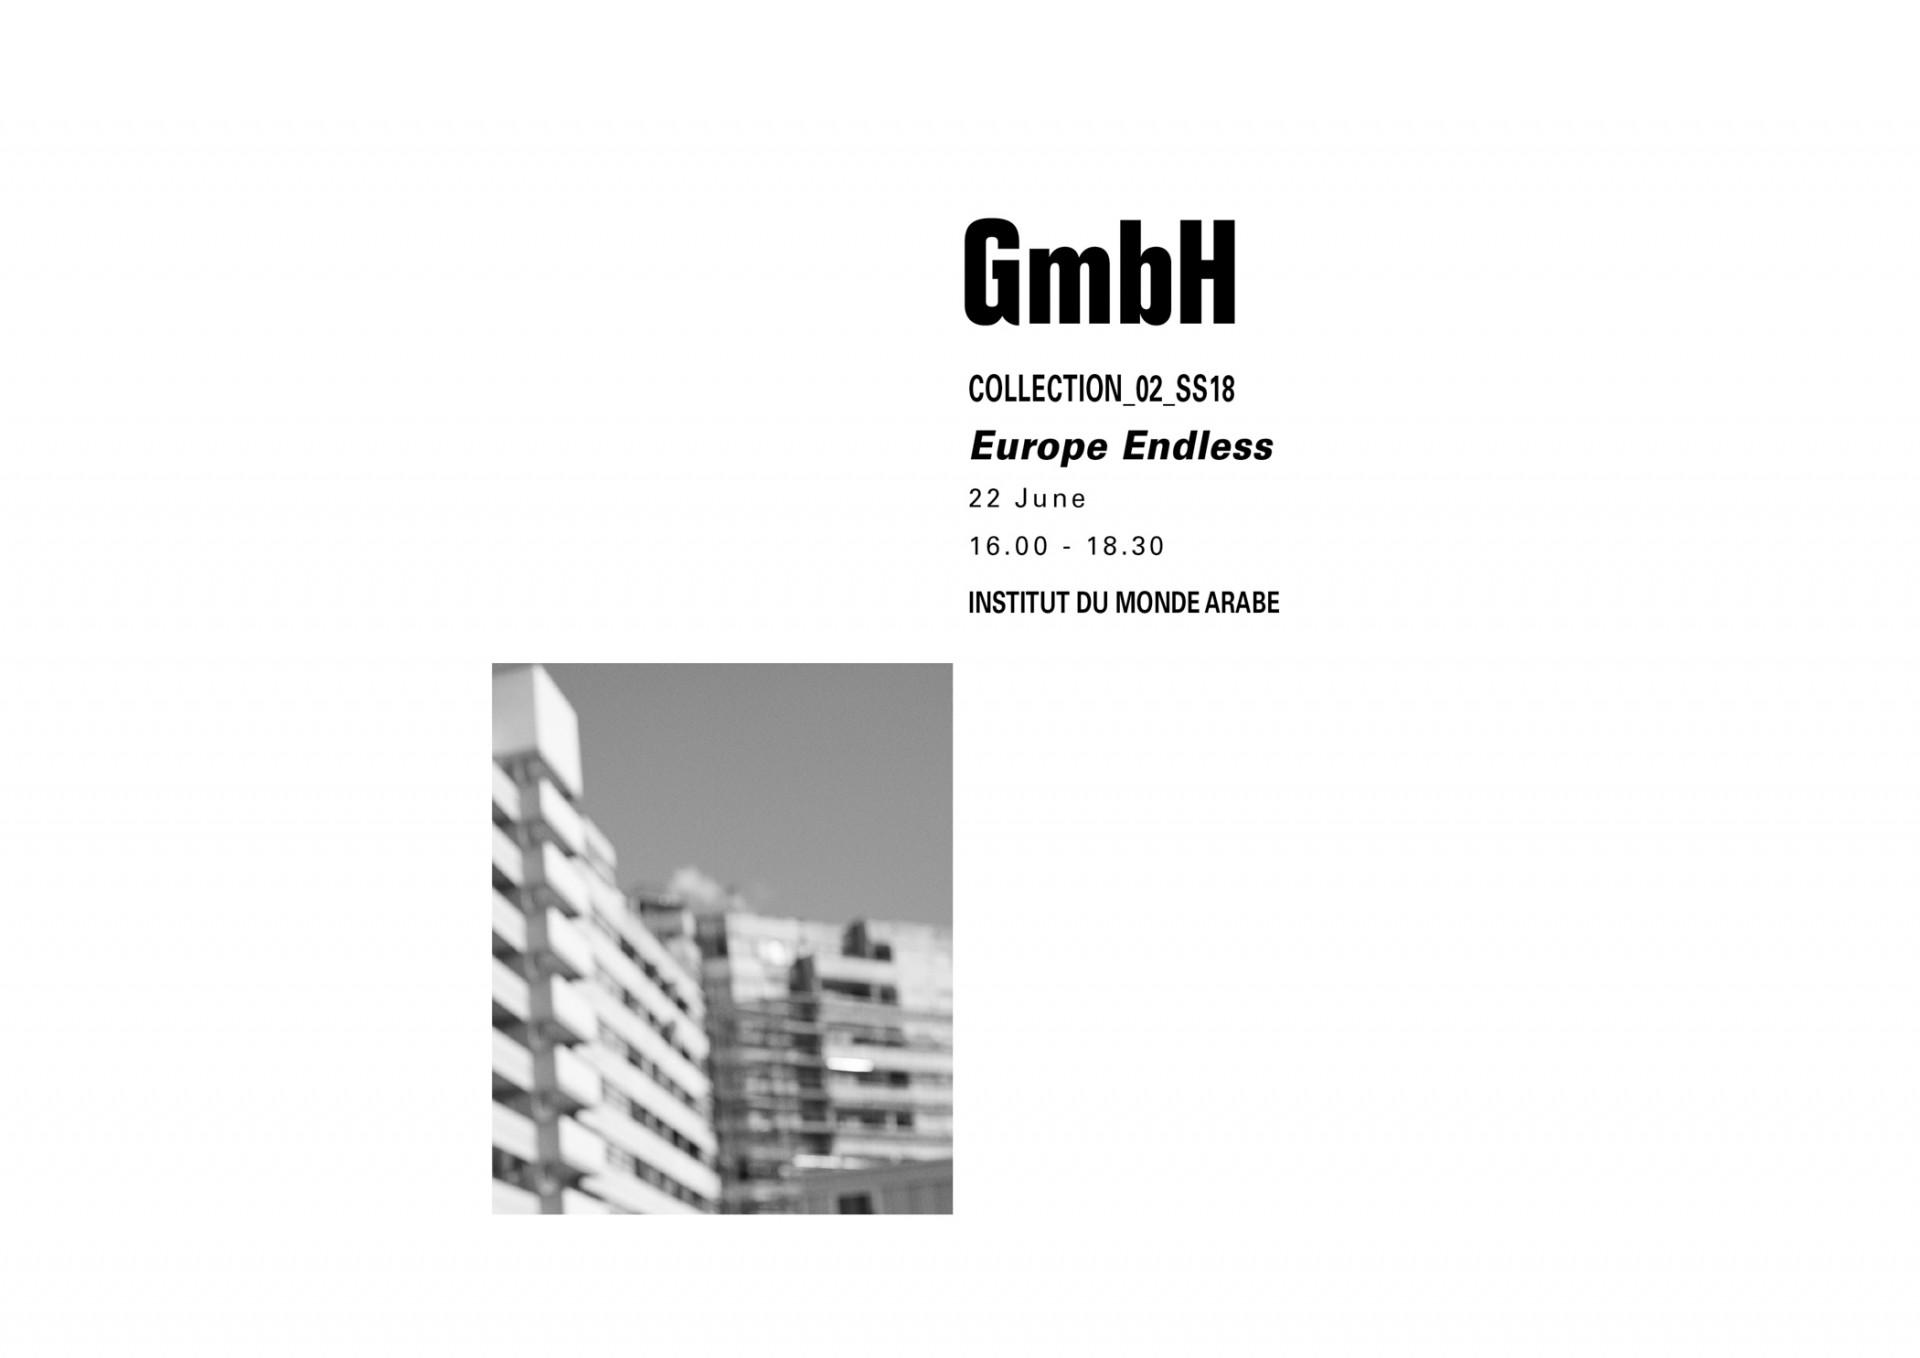 Rupert Smyth Studio gmbh